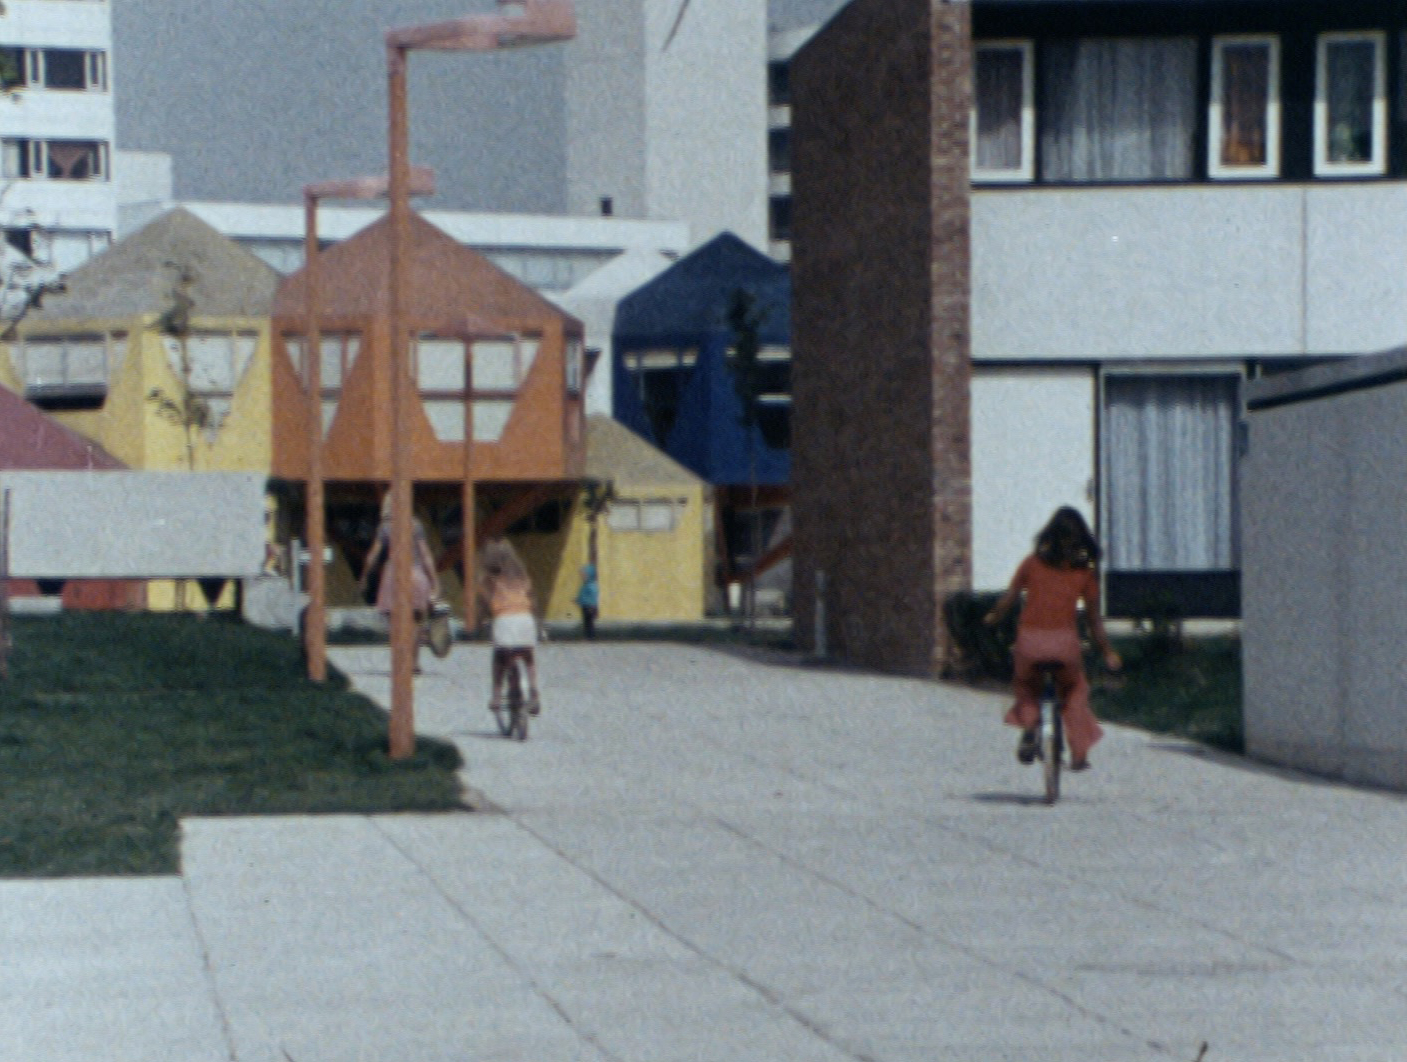 shellac-enfance-dune-ville-image-4648-copyright-shellac.jpg